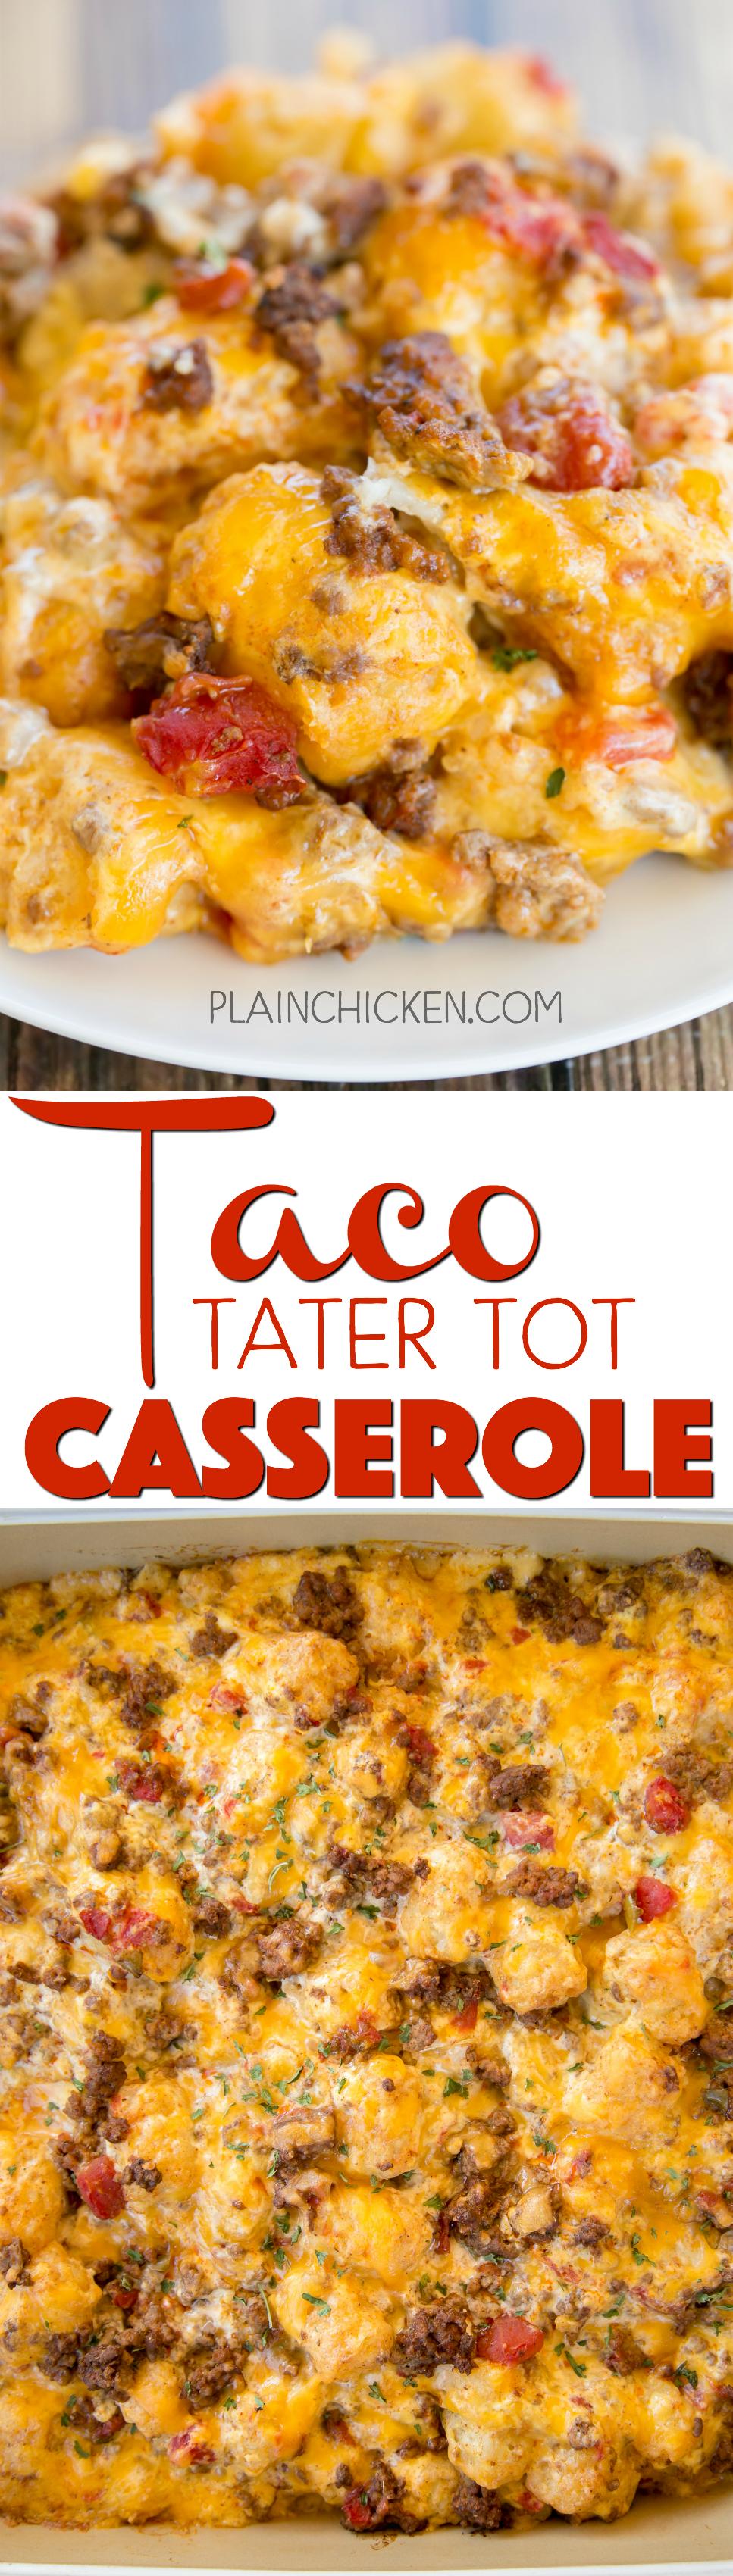 Taco Tater Tot Casserole - Plain Chicken